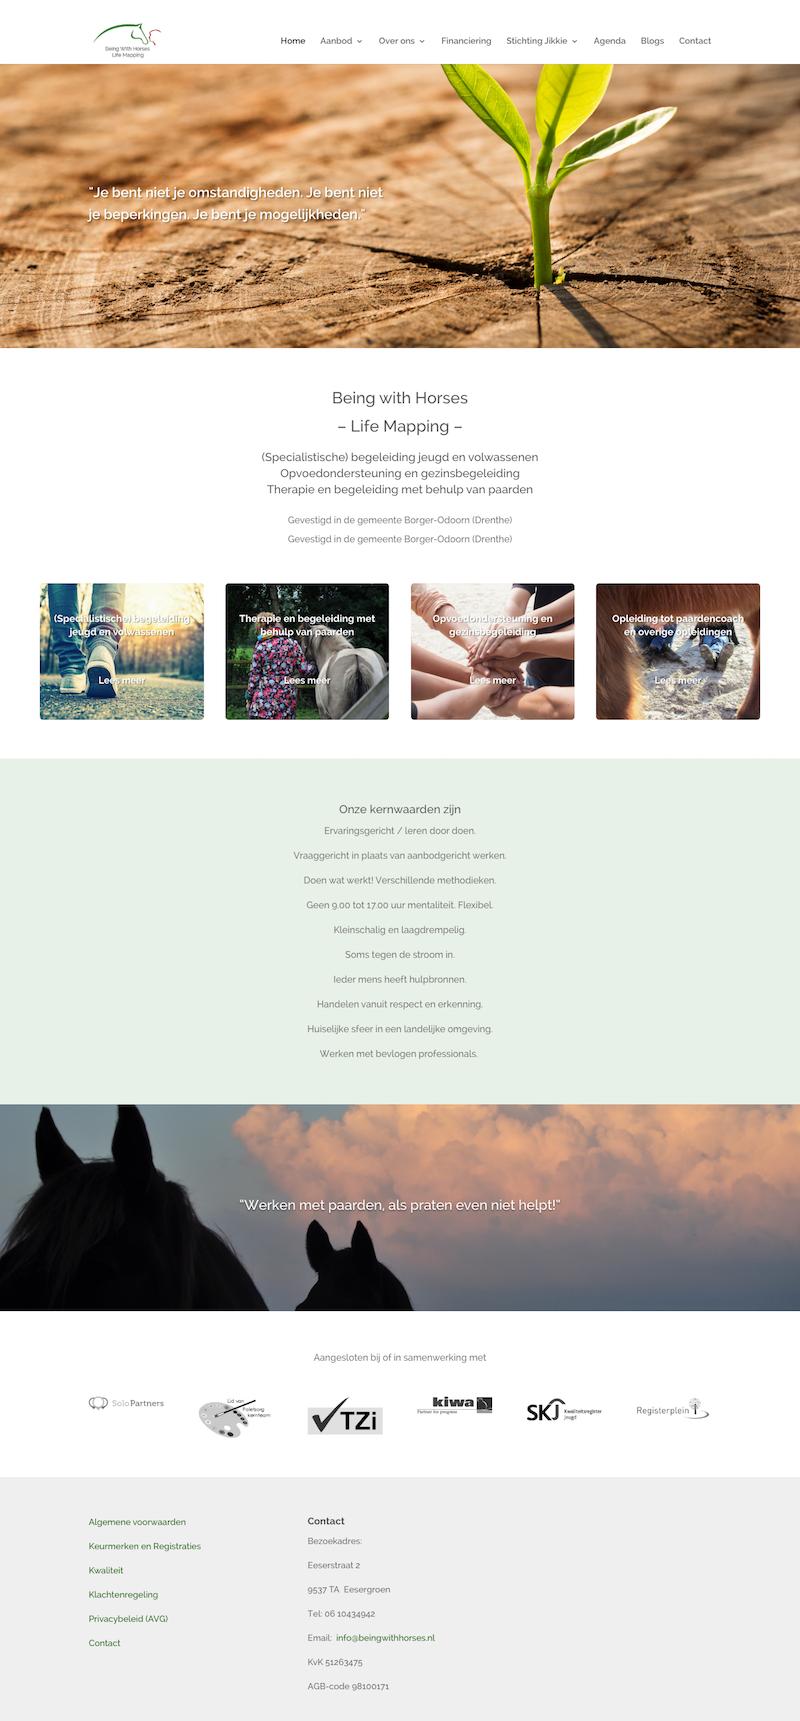 screencapture-beingwithhorses-nl-2019-11-27-17_01_57